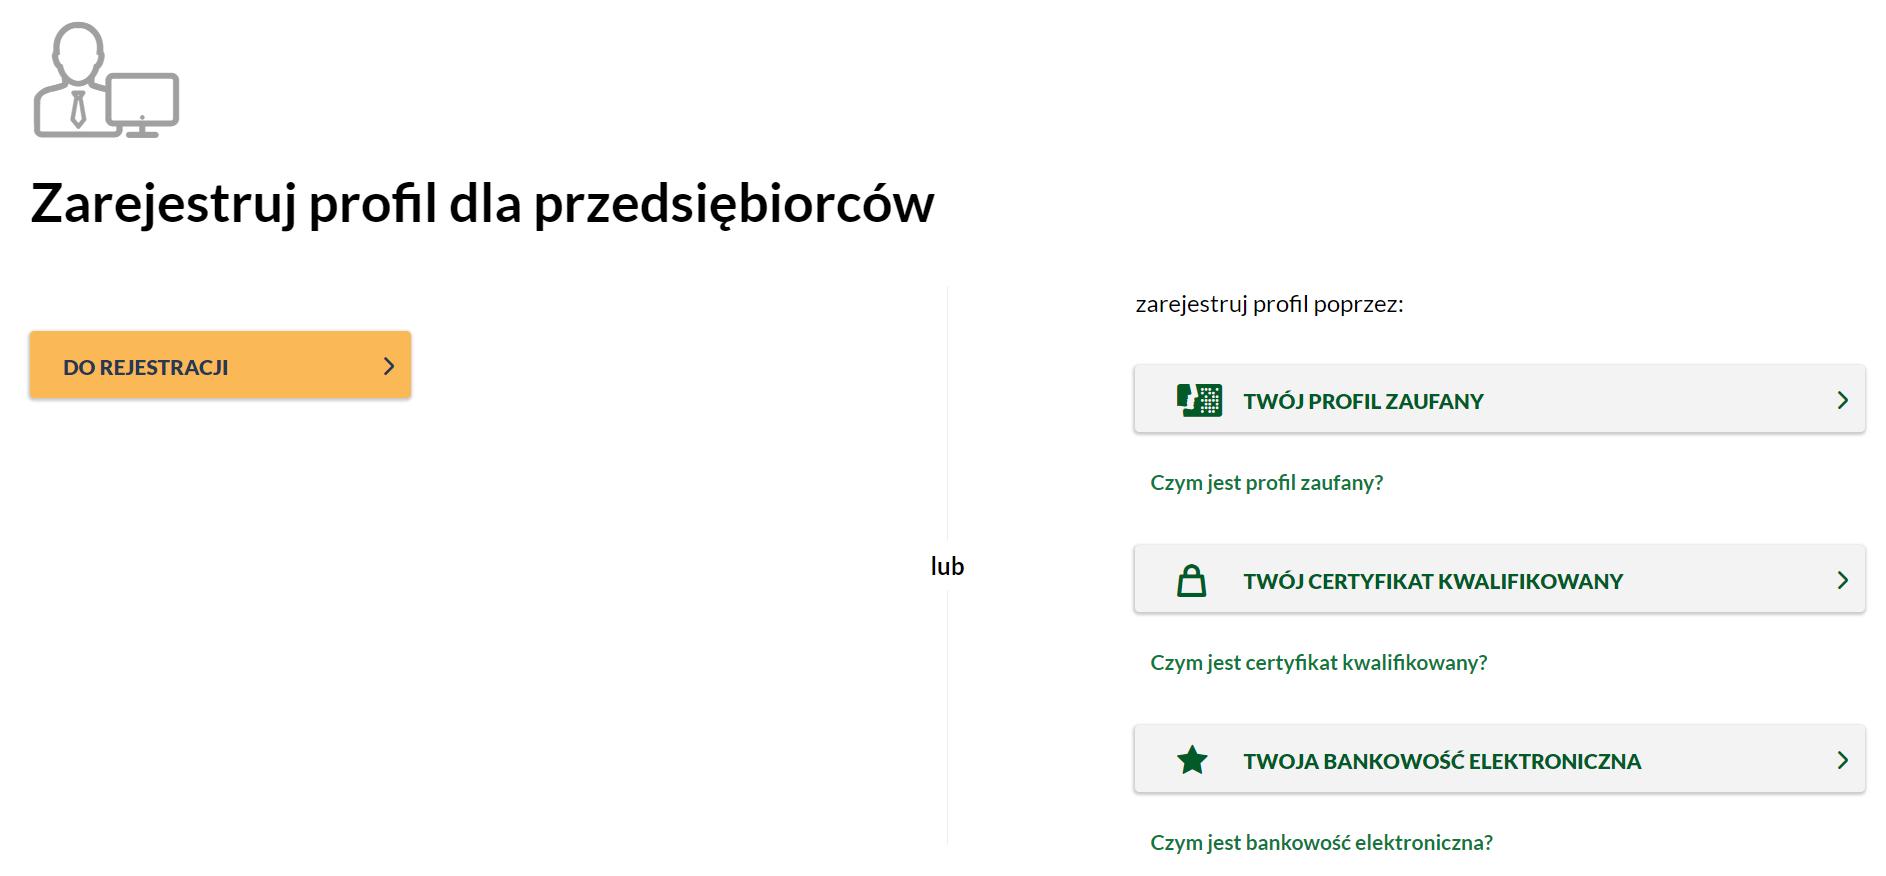 ifirma.pl program do księgowania - zus pue3